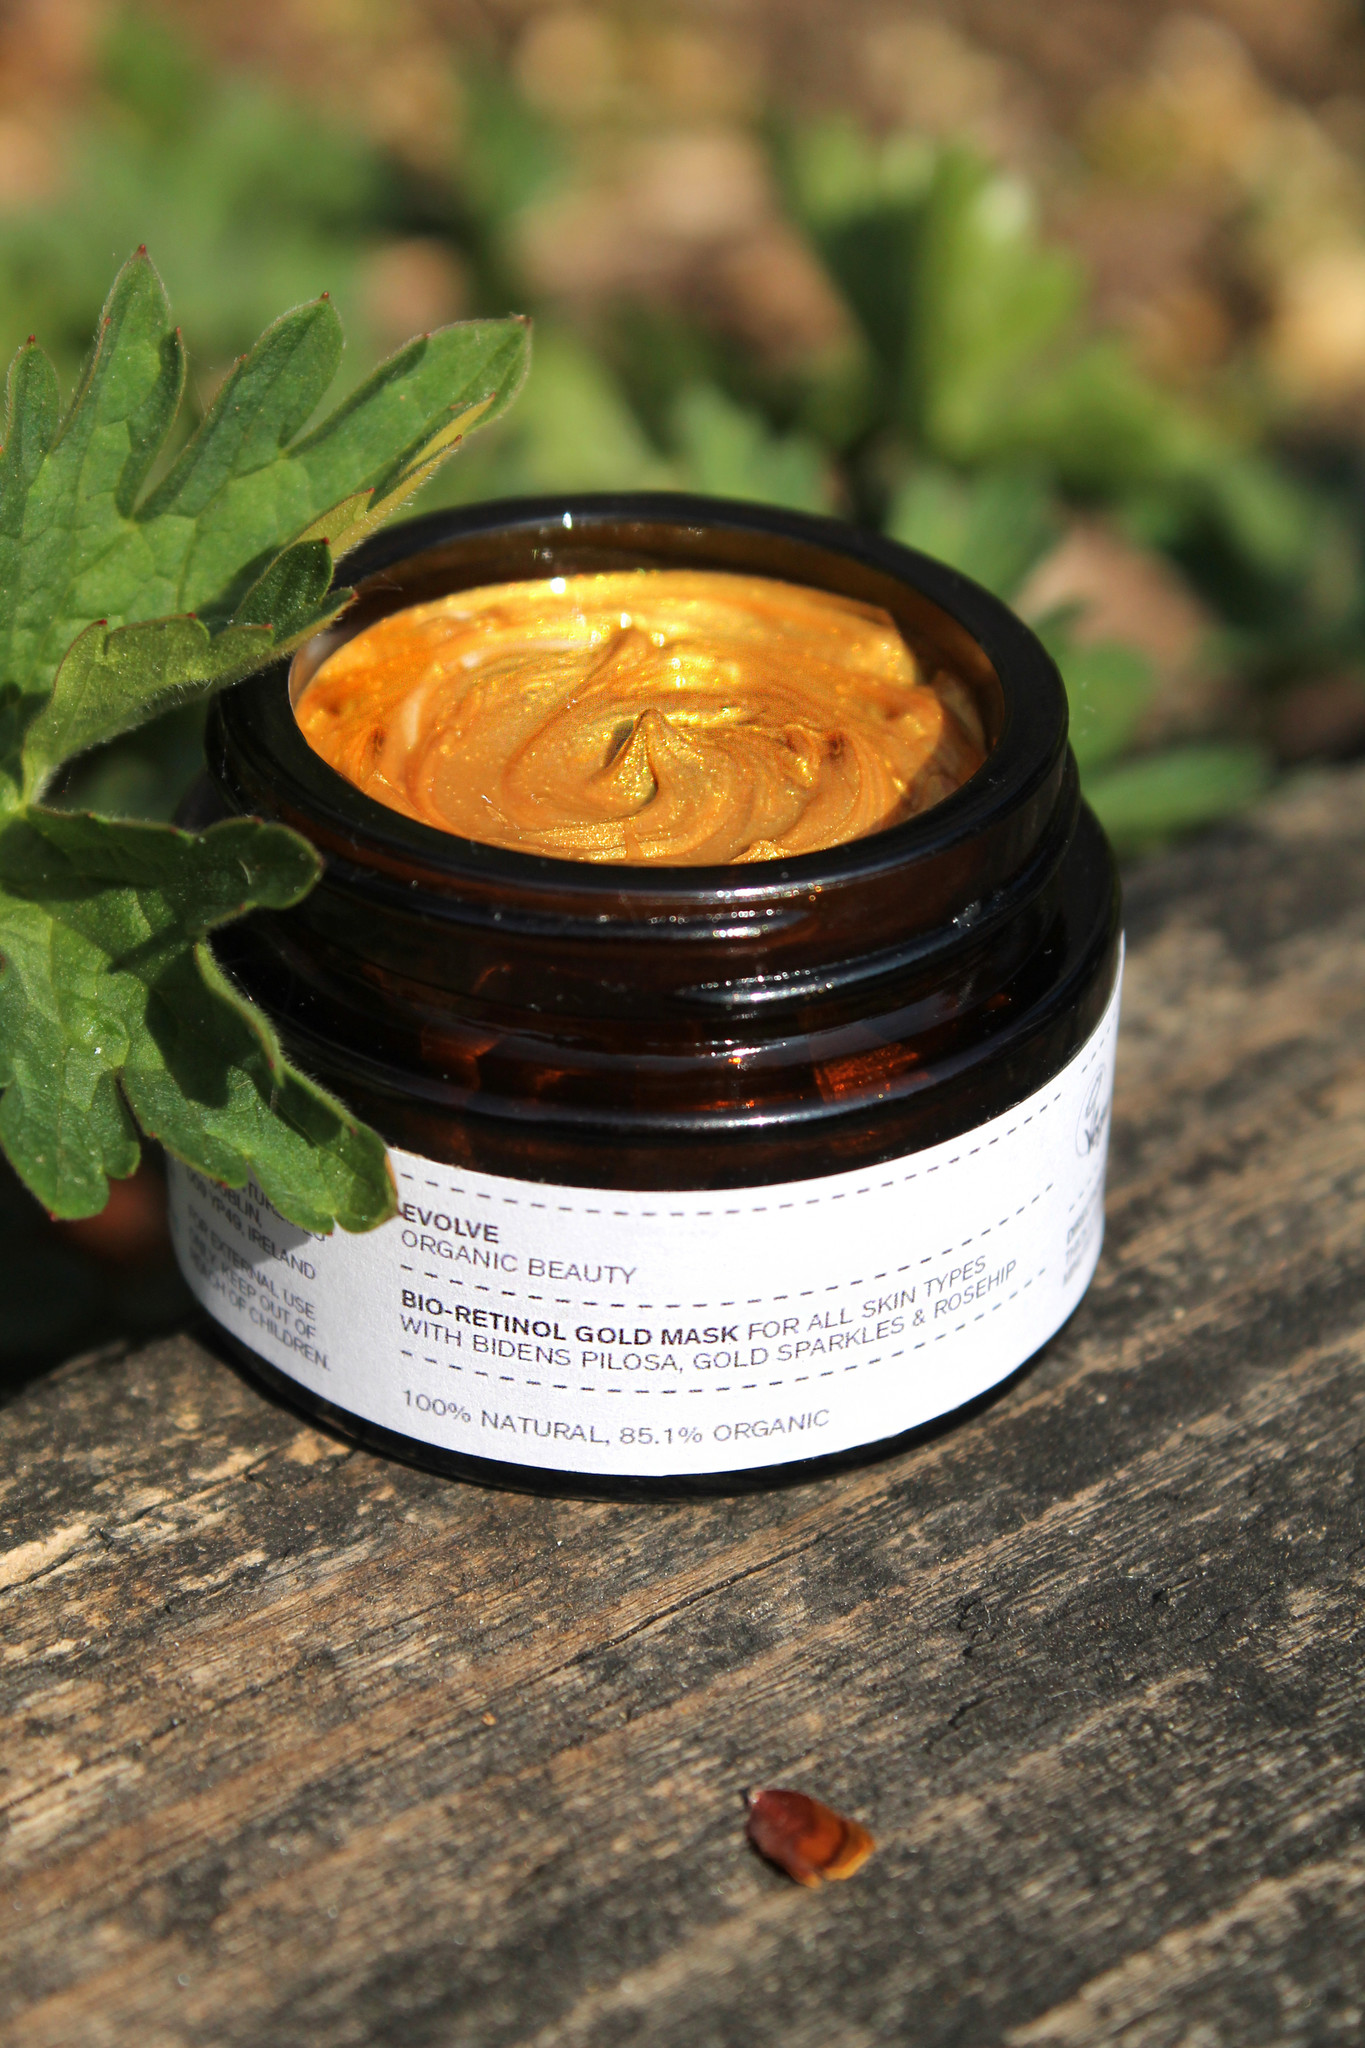 Evolve Beauty  Bio-Retinol Gold Mask